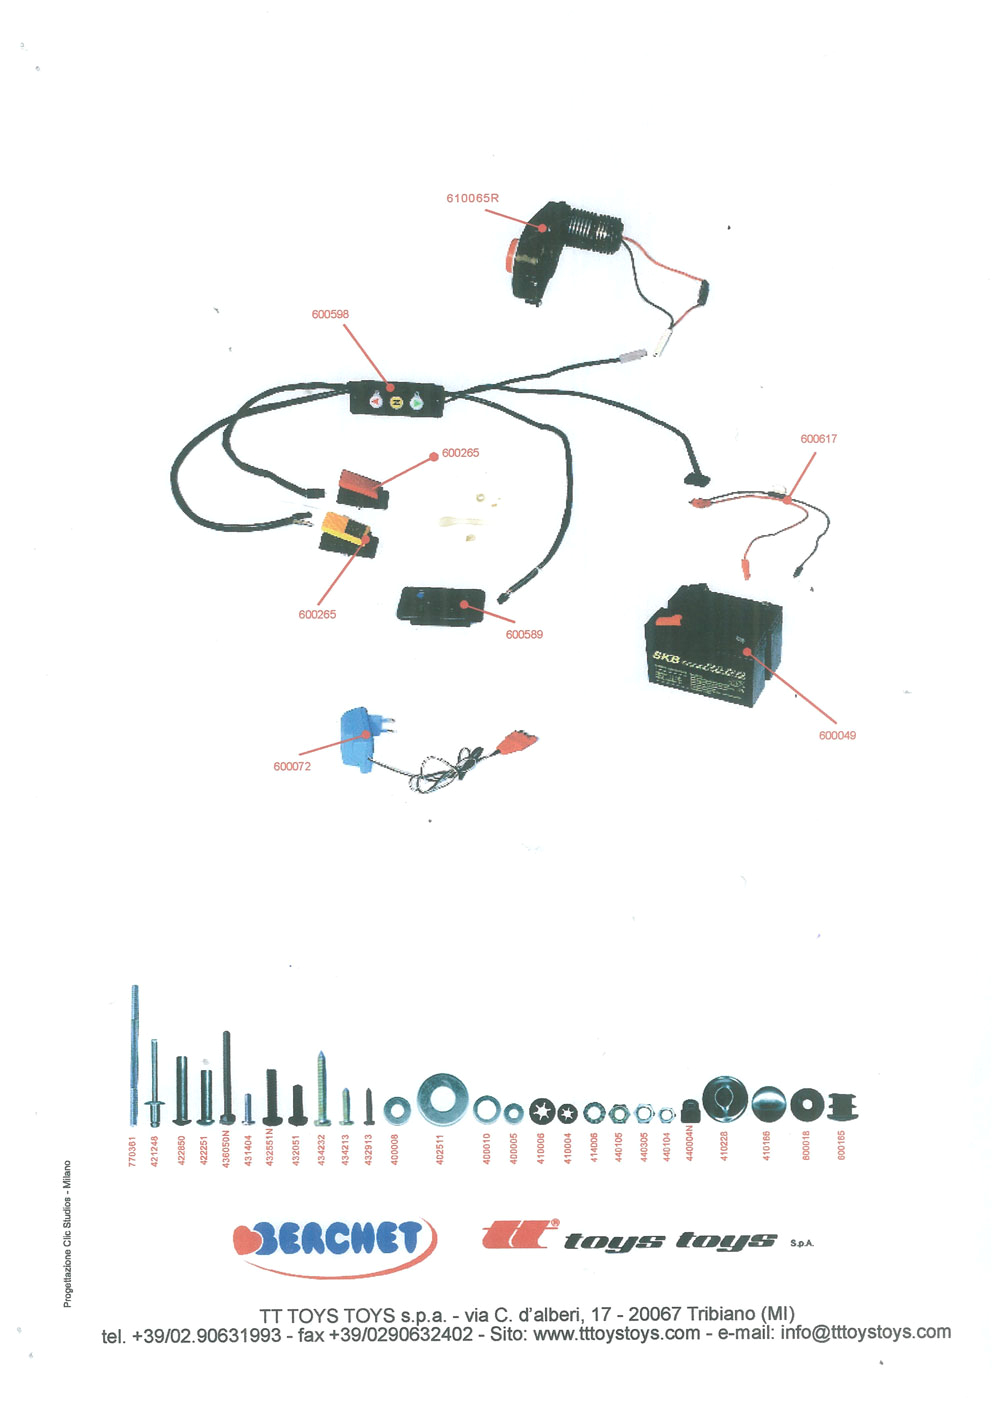 49cc 2 stroke pocket bike wiring diagram data schematic diagram 49cc bicycle wiring diagram